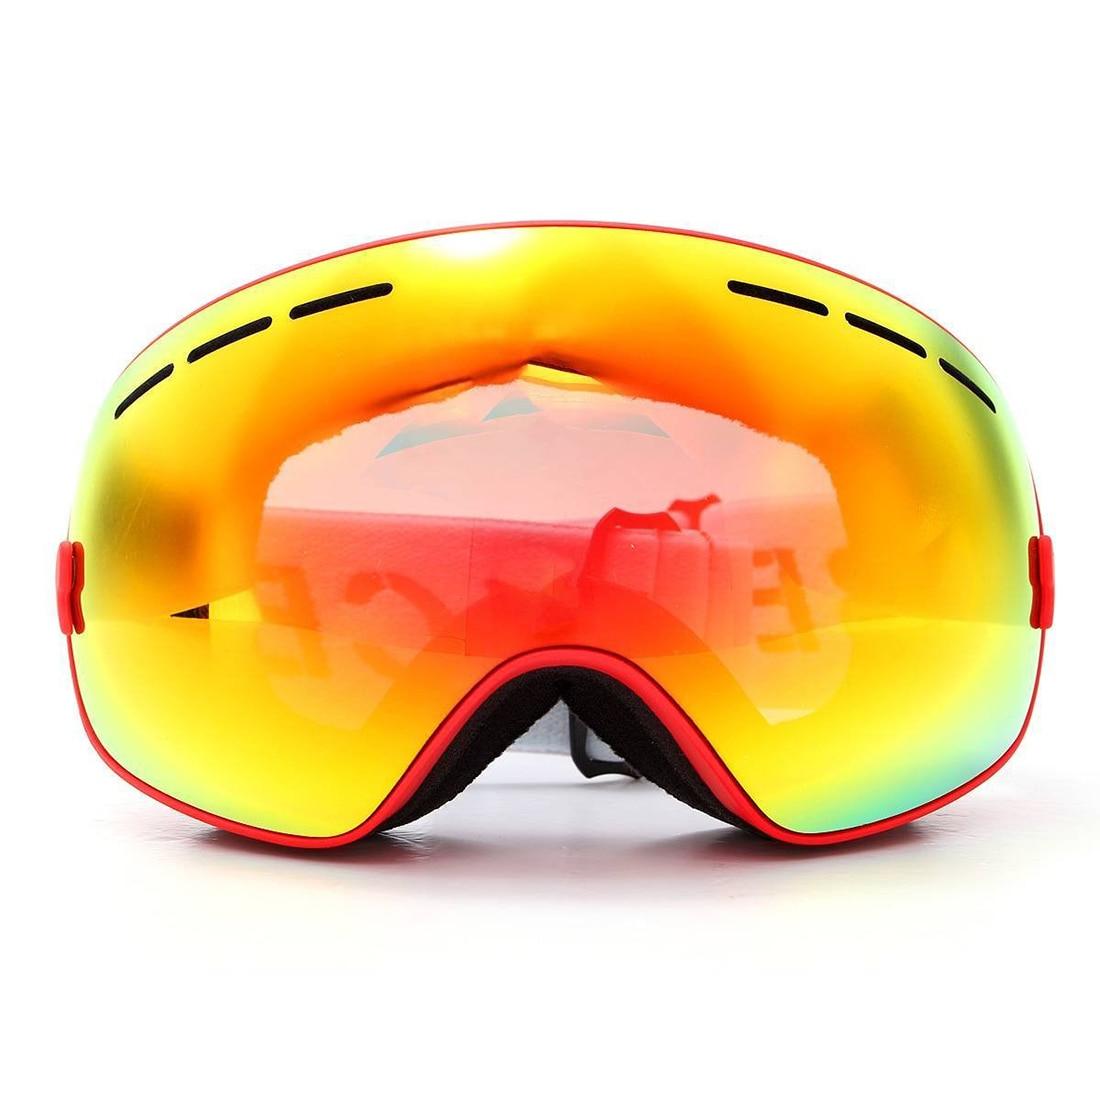 5Set Sale BENICE ski goggles double layer anti-fog eyes red frame